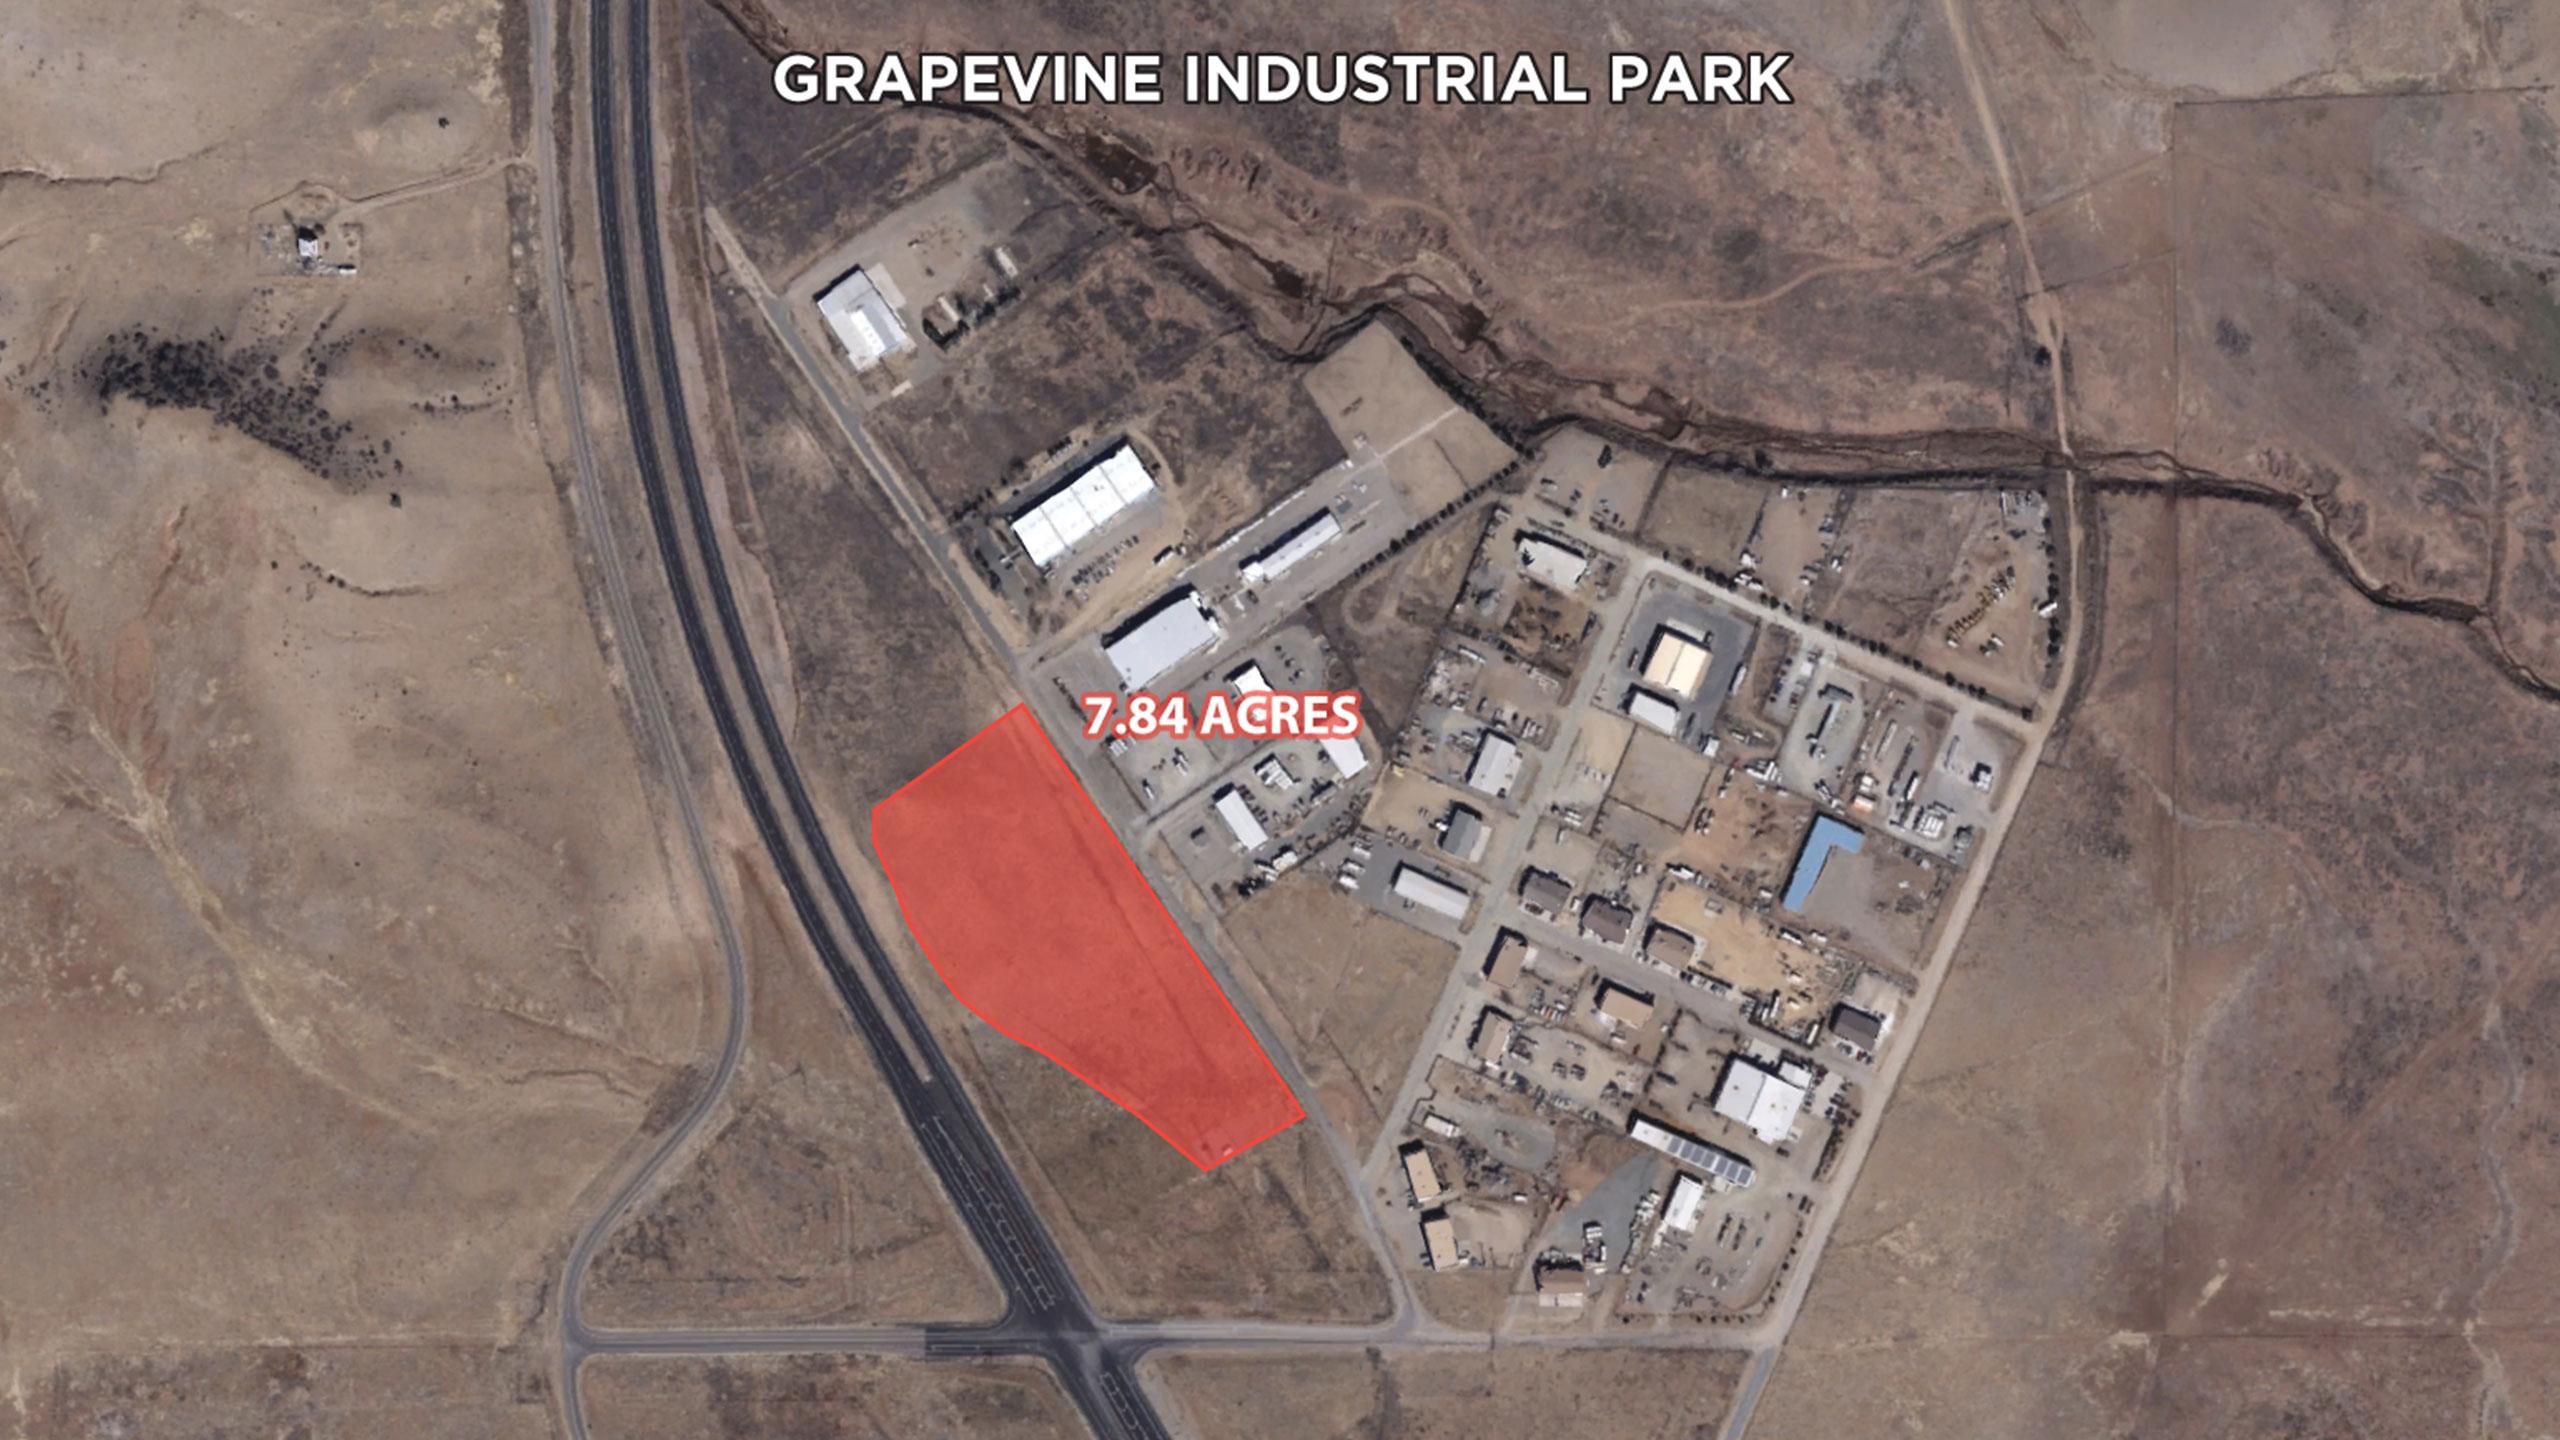 Grapevine Industrial Park